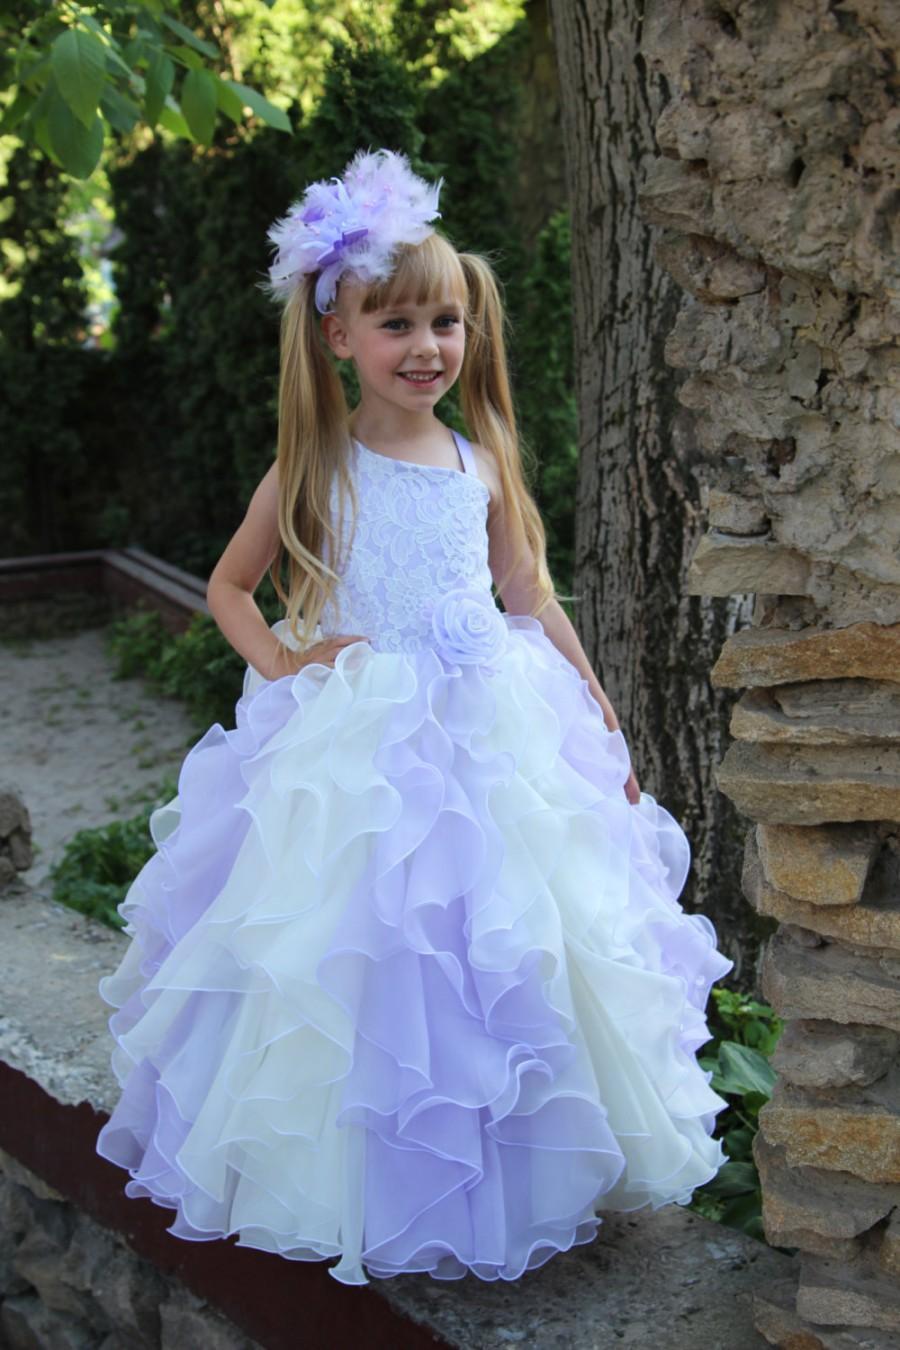 Wedding - Chiffon Ivory Lilac Flower Girl Dress - Birthday Wedding Party Holiday Ivory and Lilac Flower Girl Chiffon Lace Dress